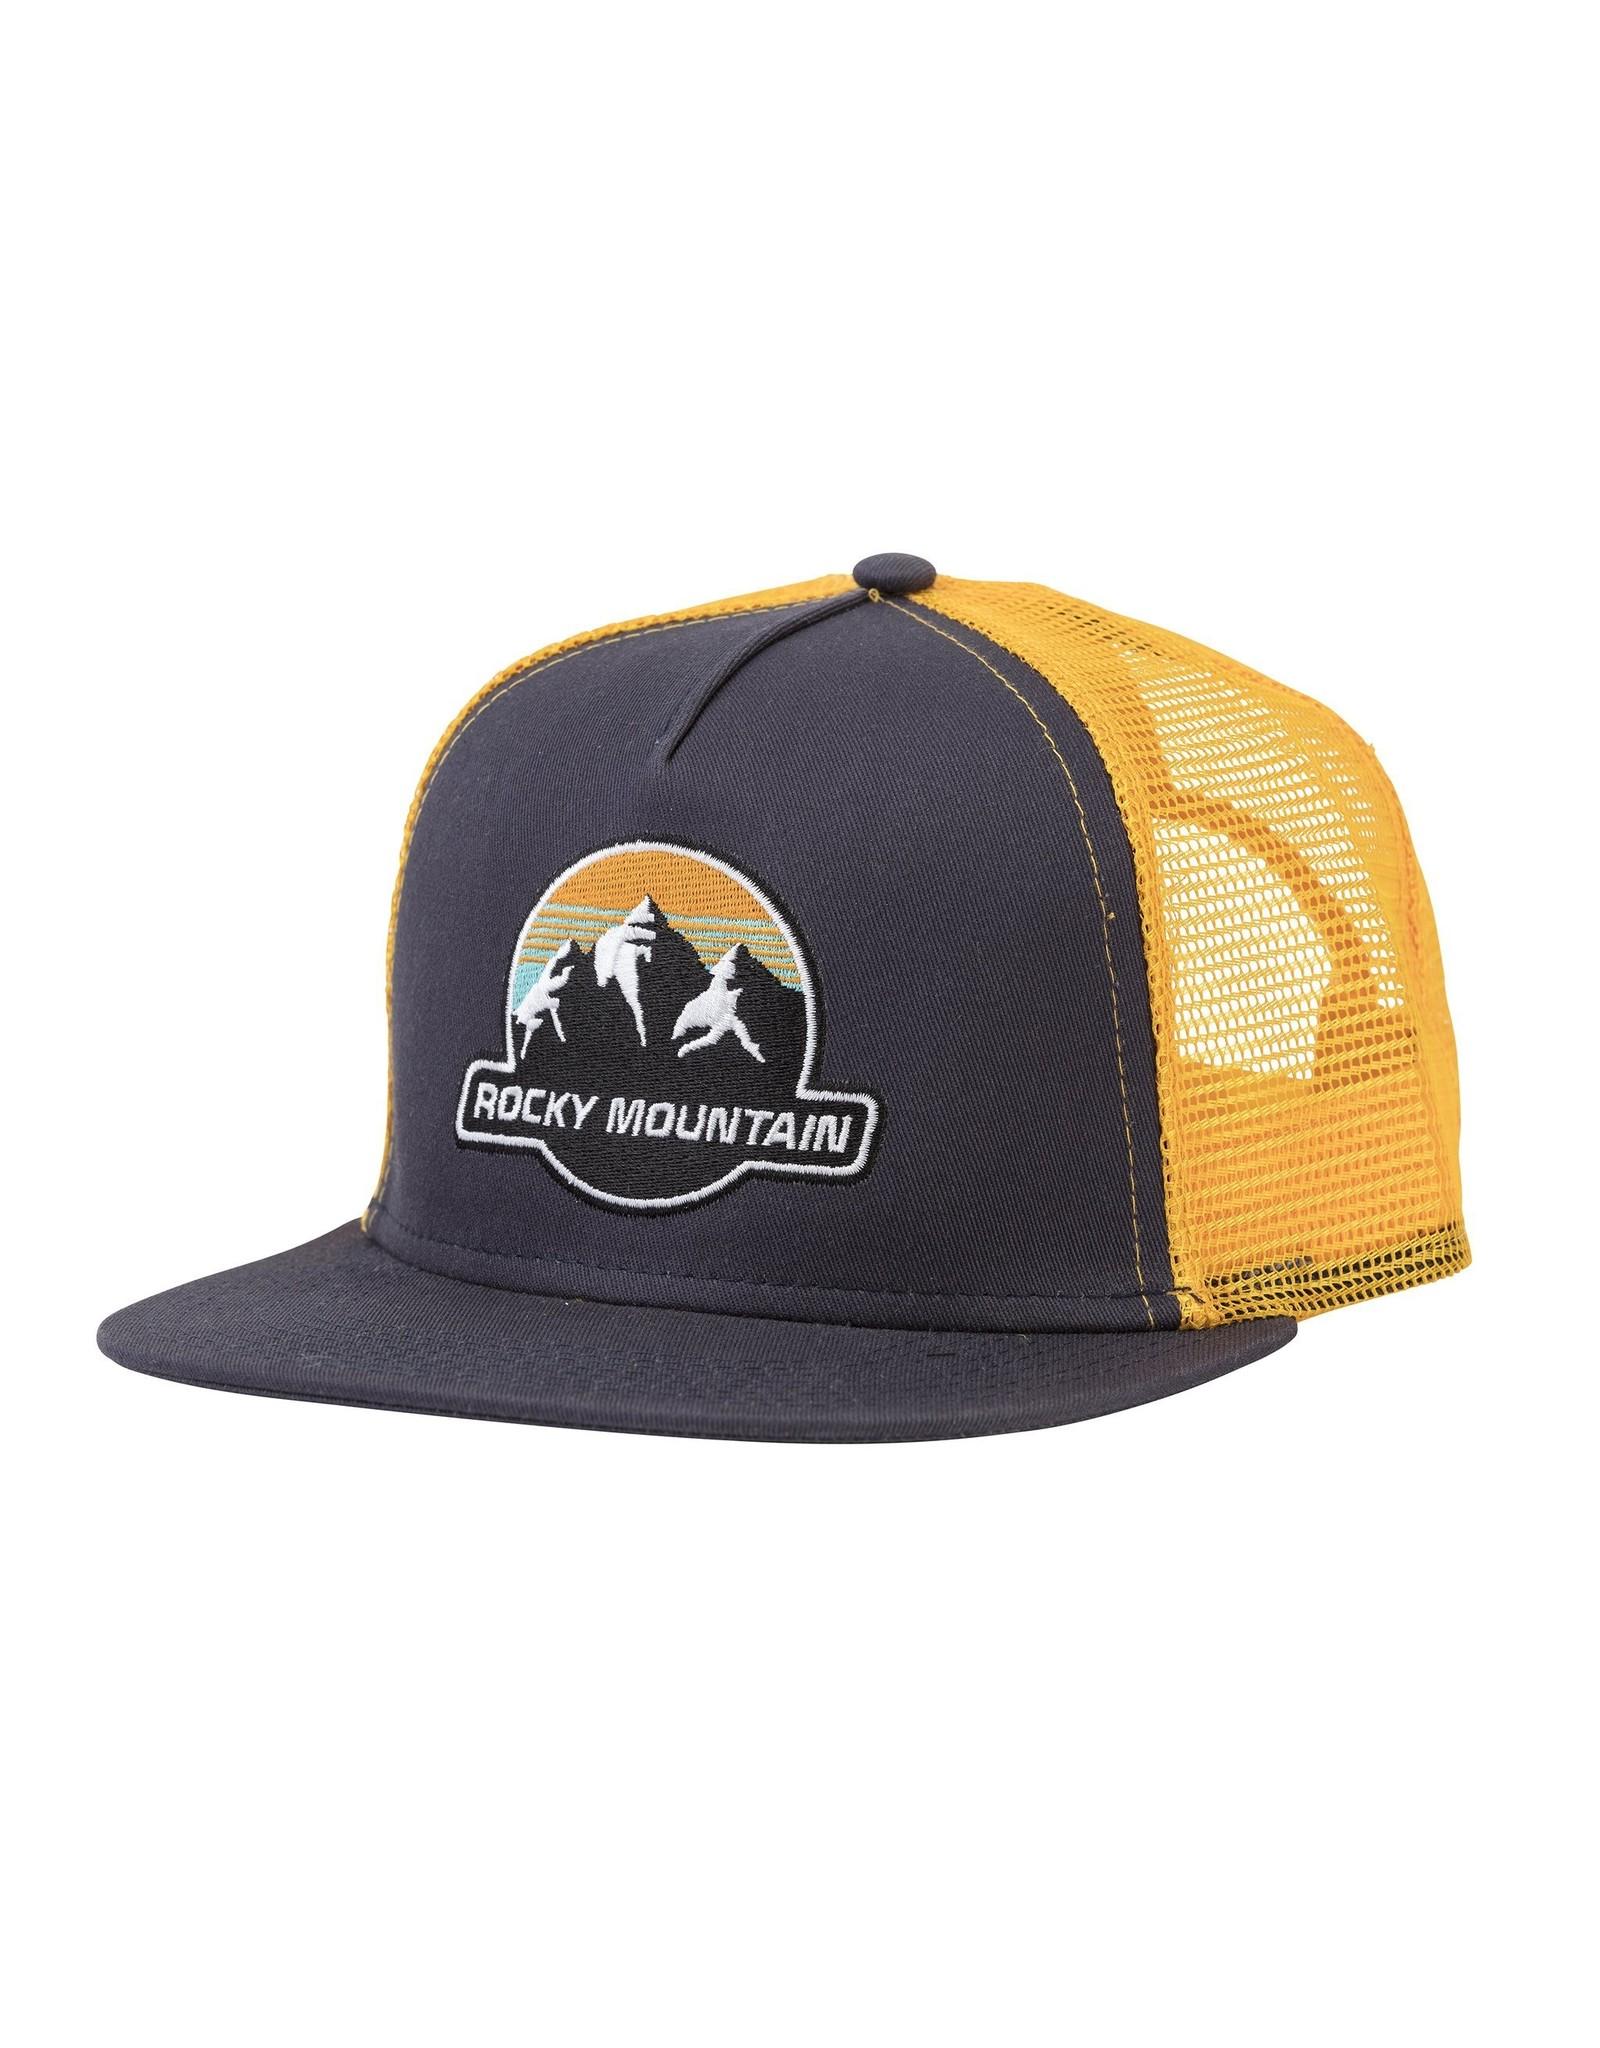 Rocky Mountain Rocky Mountain Logo Trucker Hat - Altitude